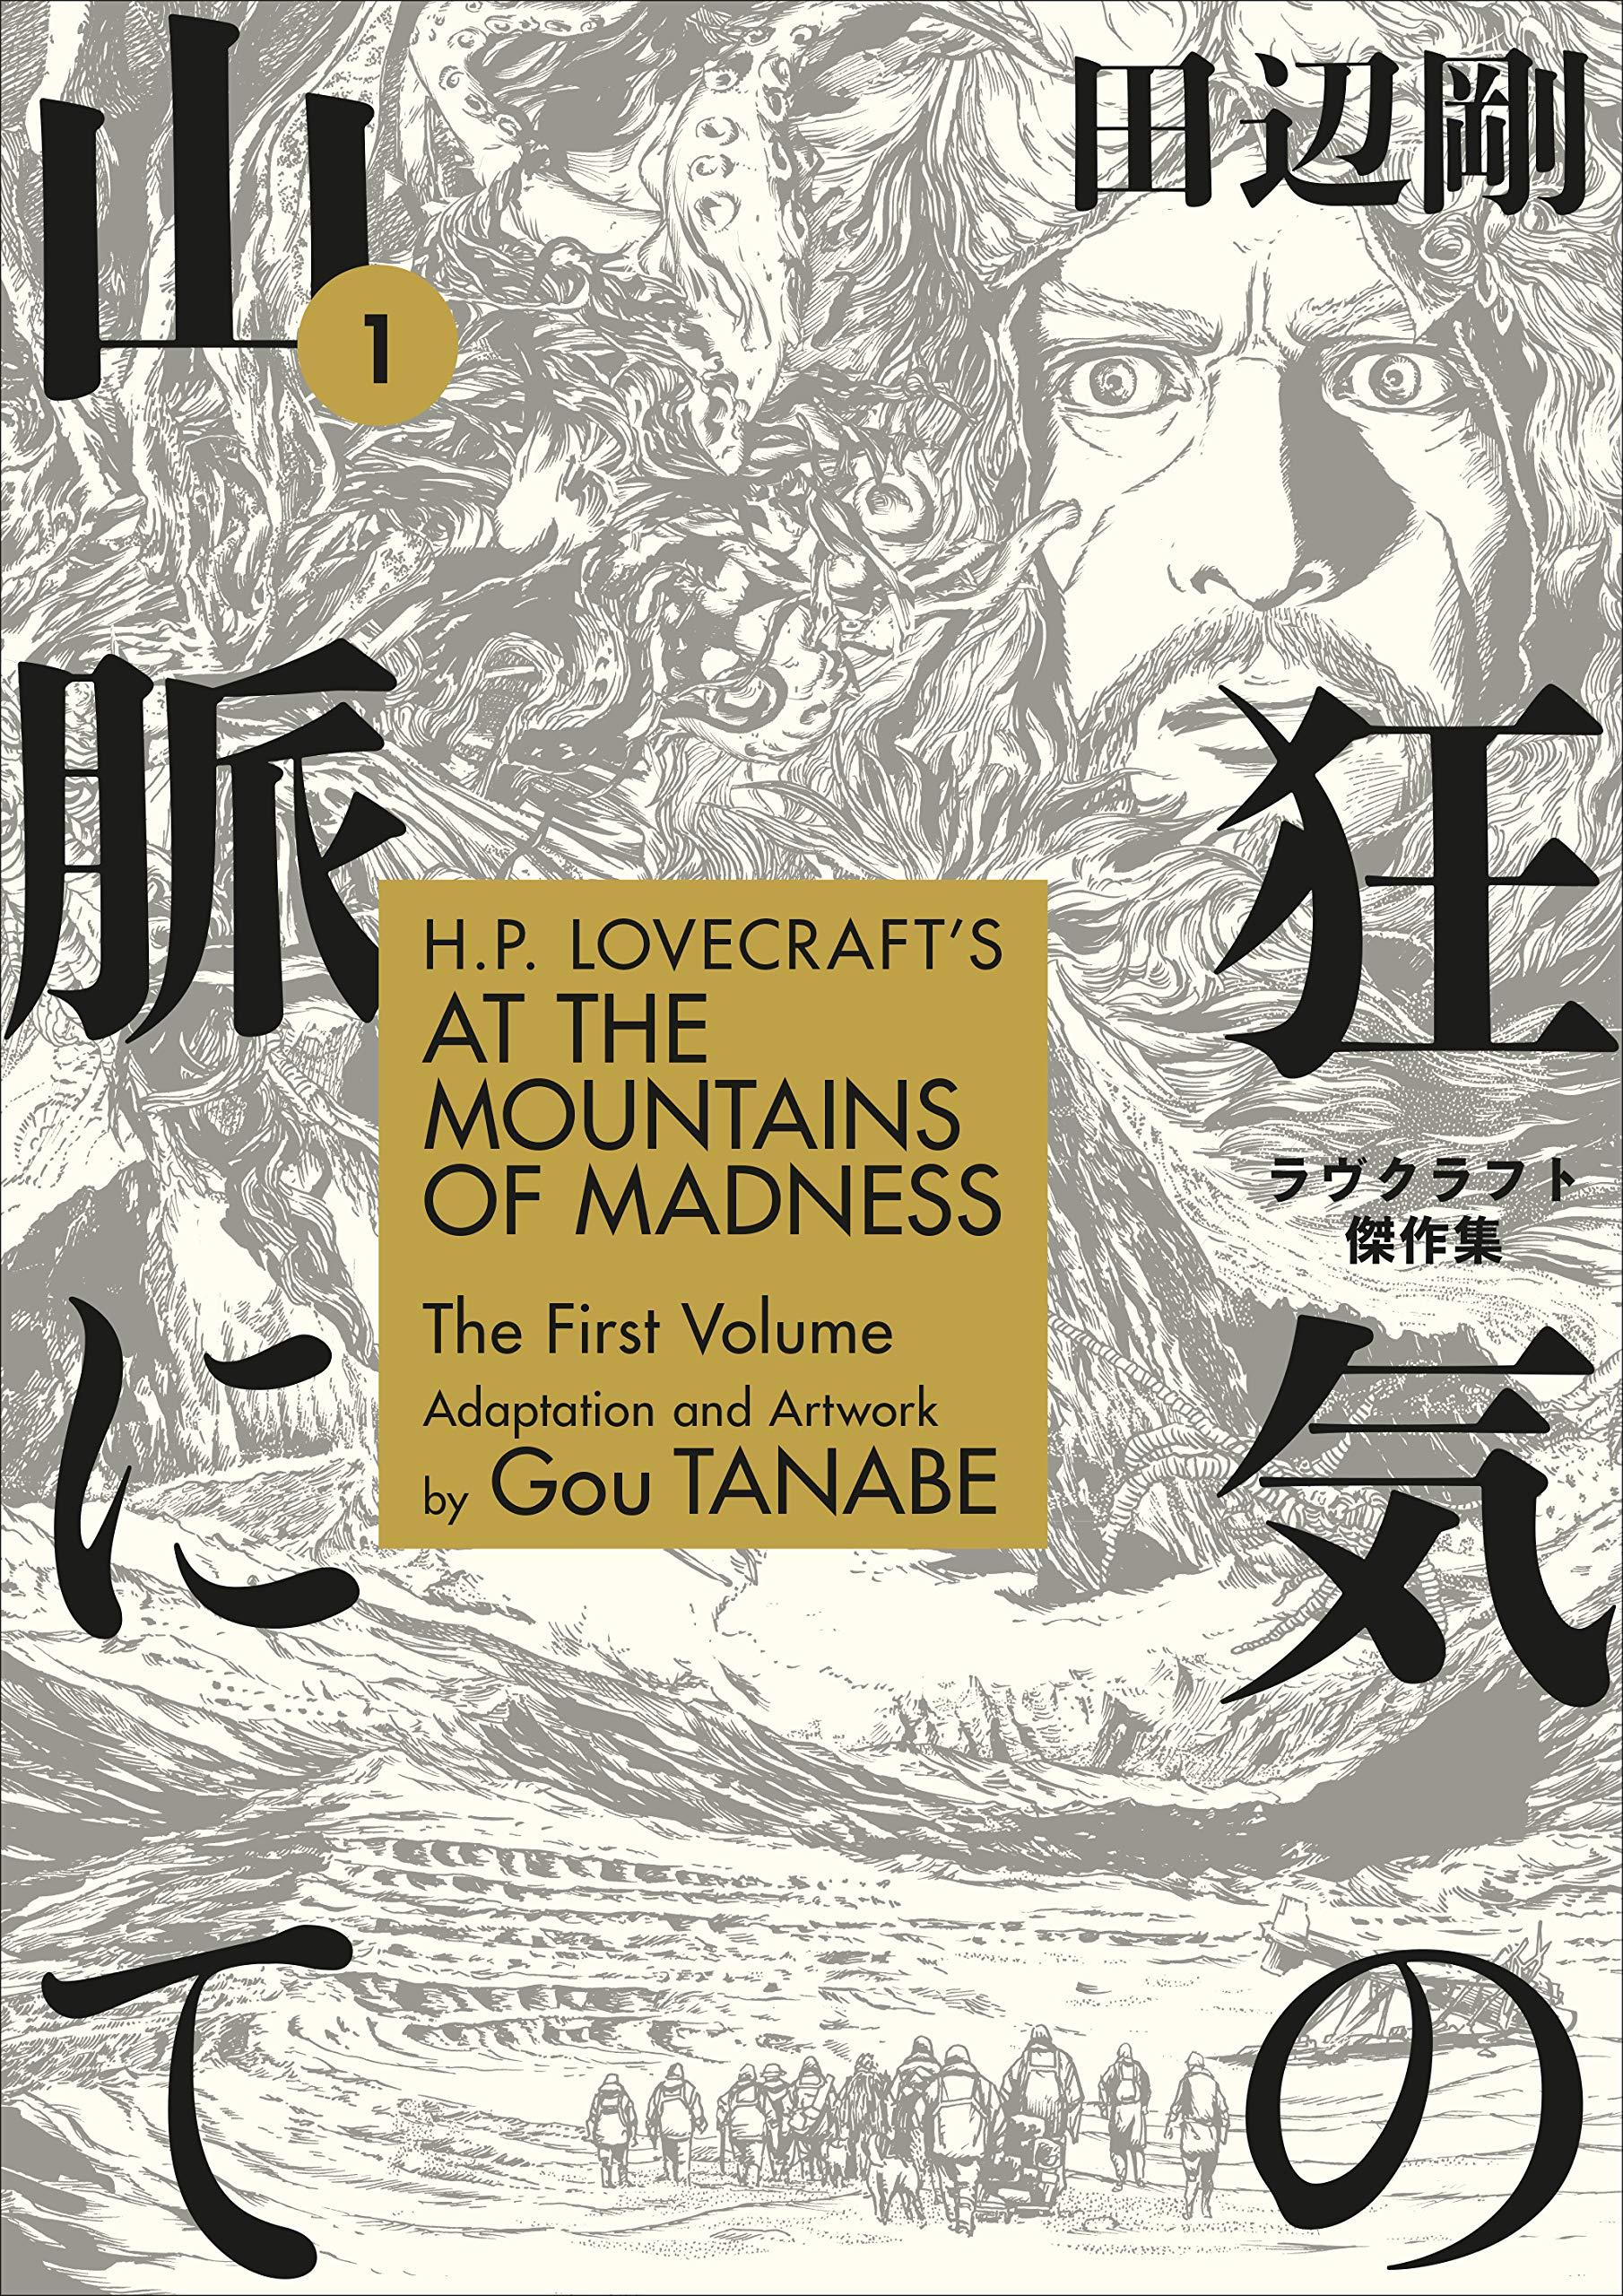 El topic de H. P. LOVECRAFT - Página 4 Kyouki-no-Sanmyaku-Nite-manga